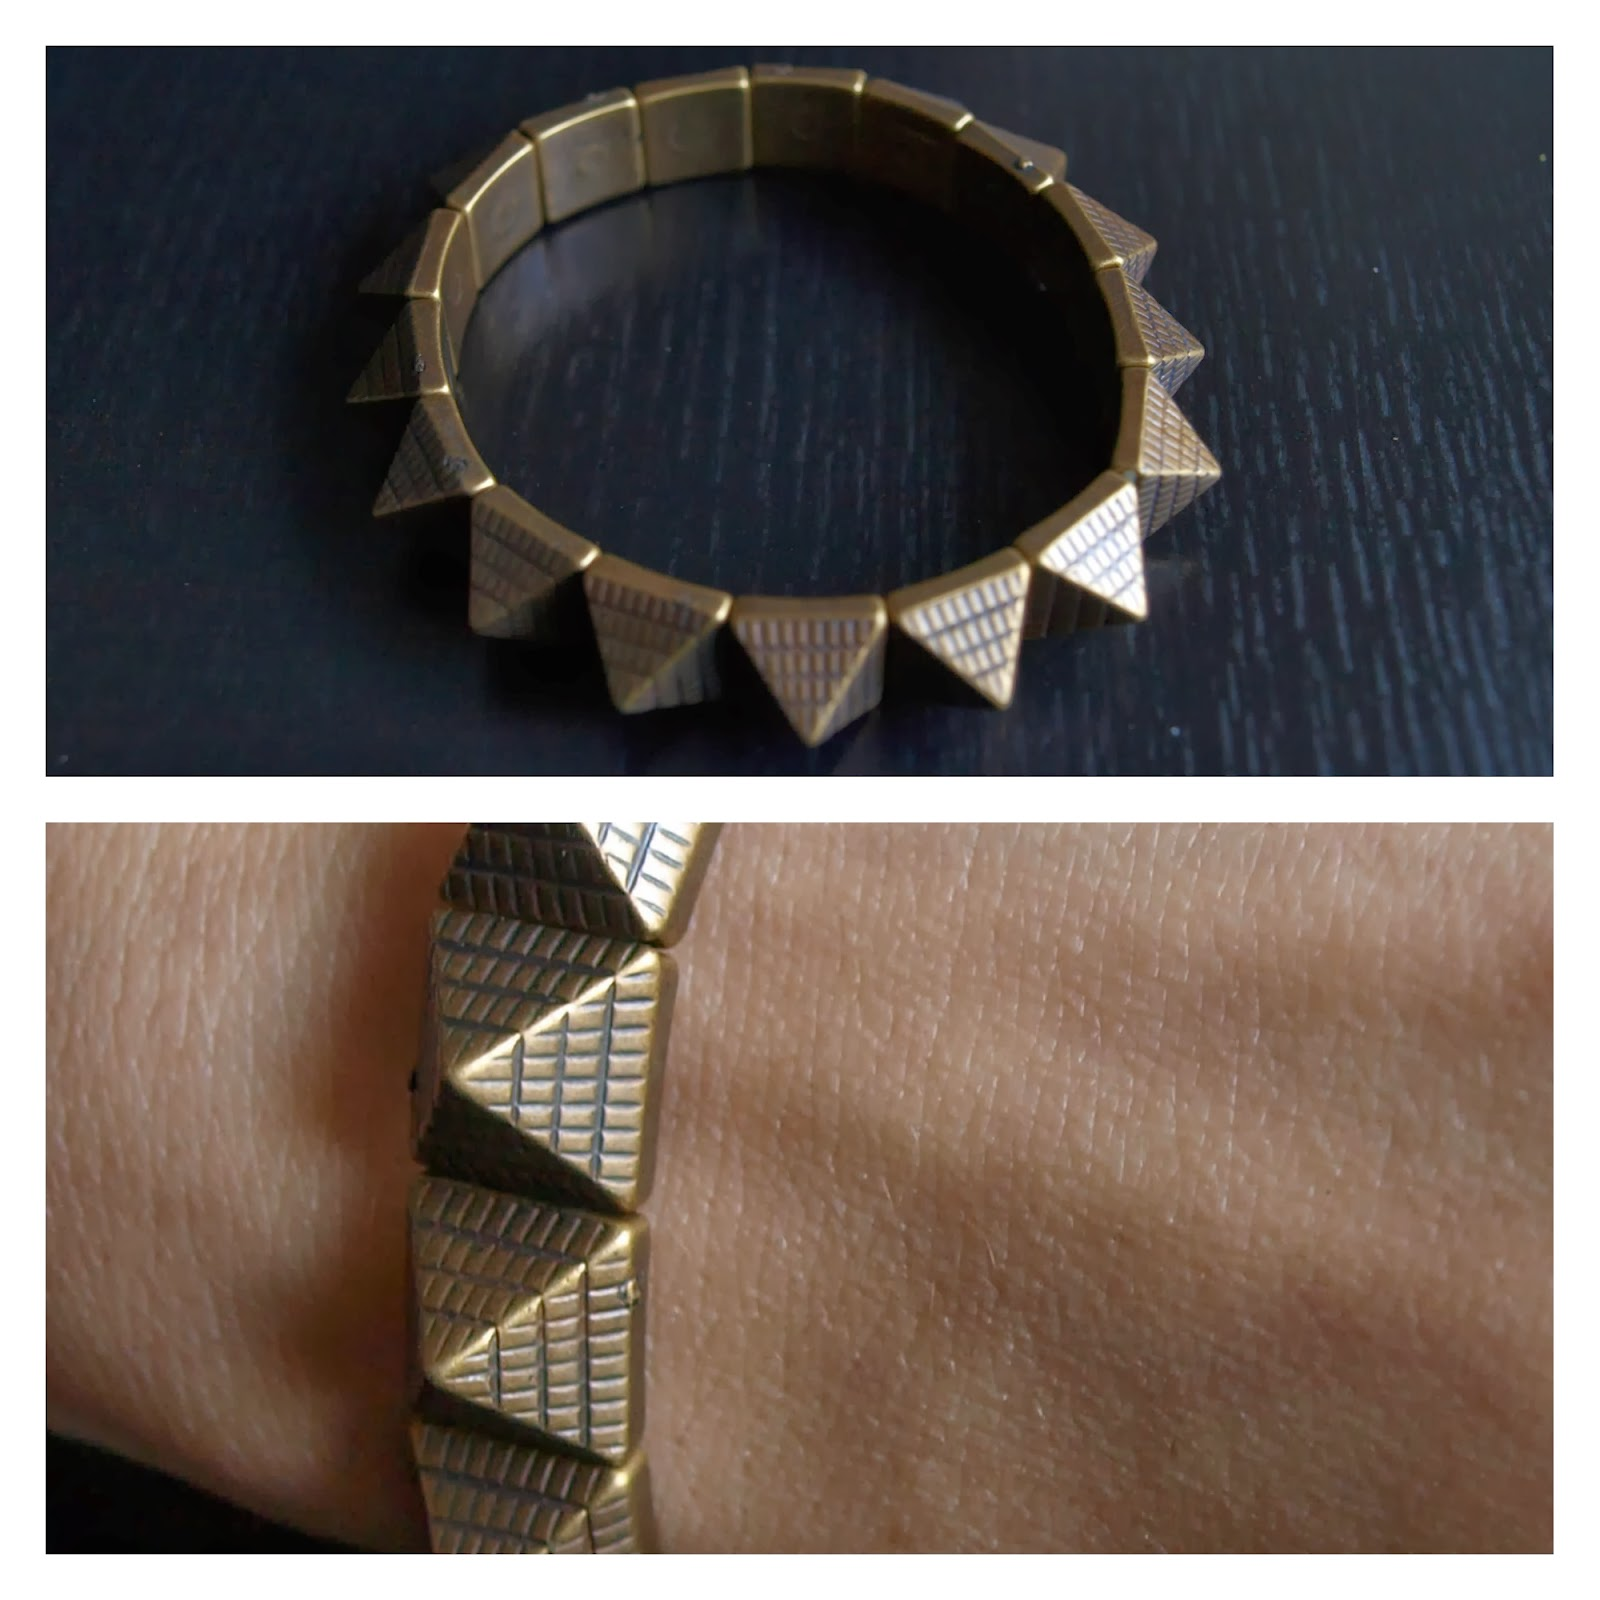 Pedido buyincoins haul review brochas collar bracelet makeup brush